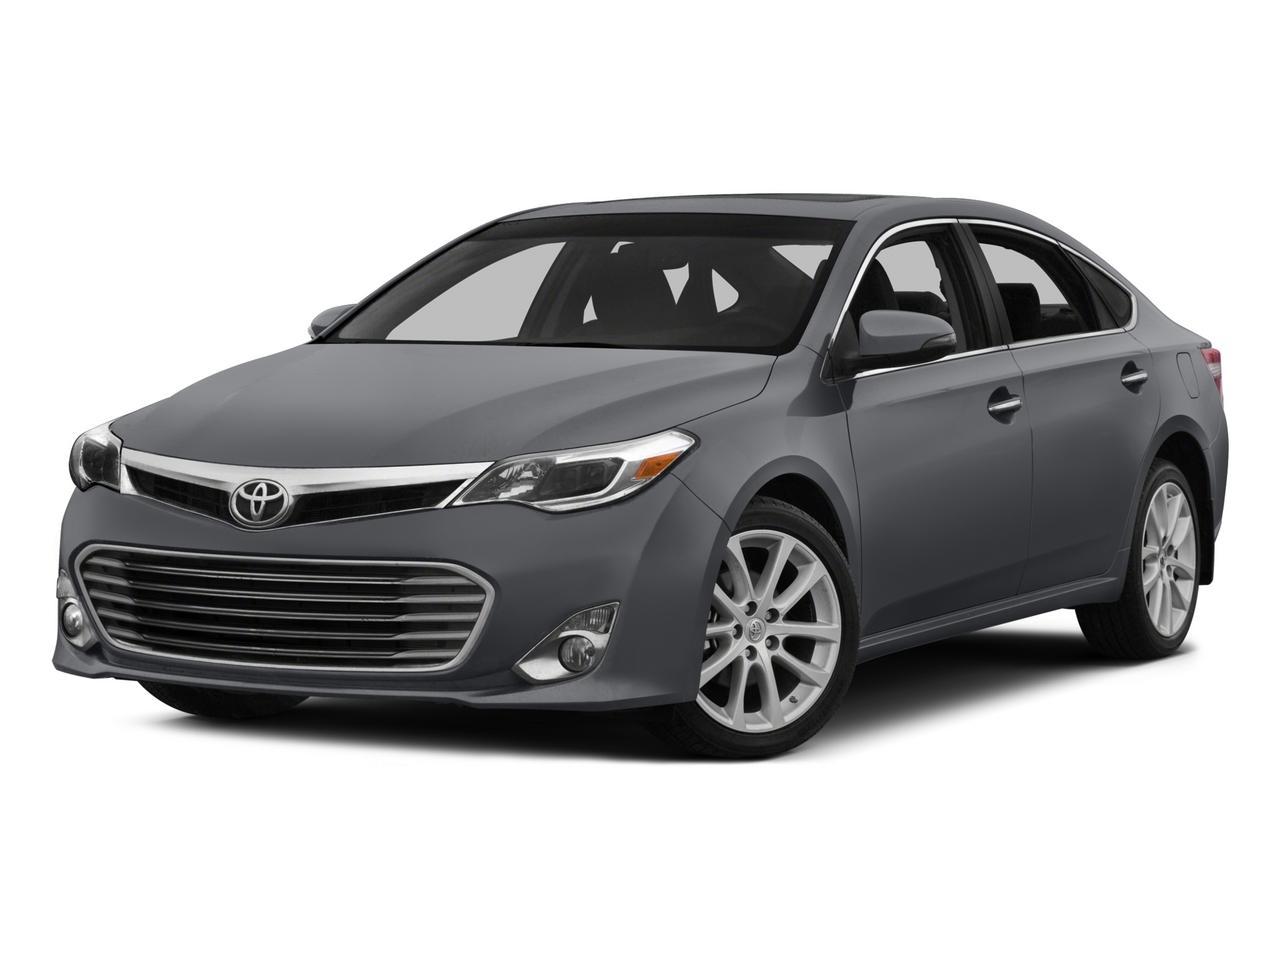 2015 Toyota Avalon Vehicle Photo in Houston, TX 77090